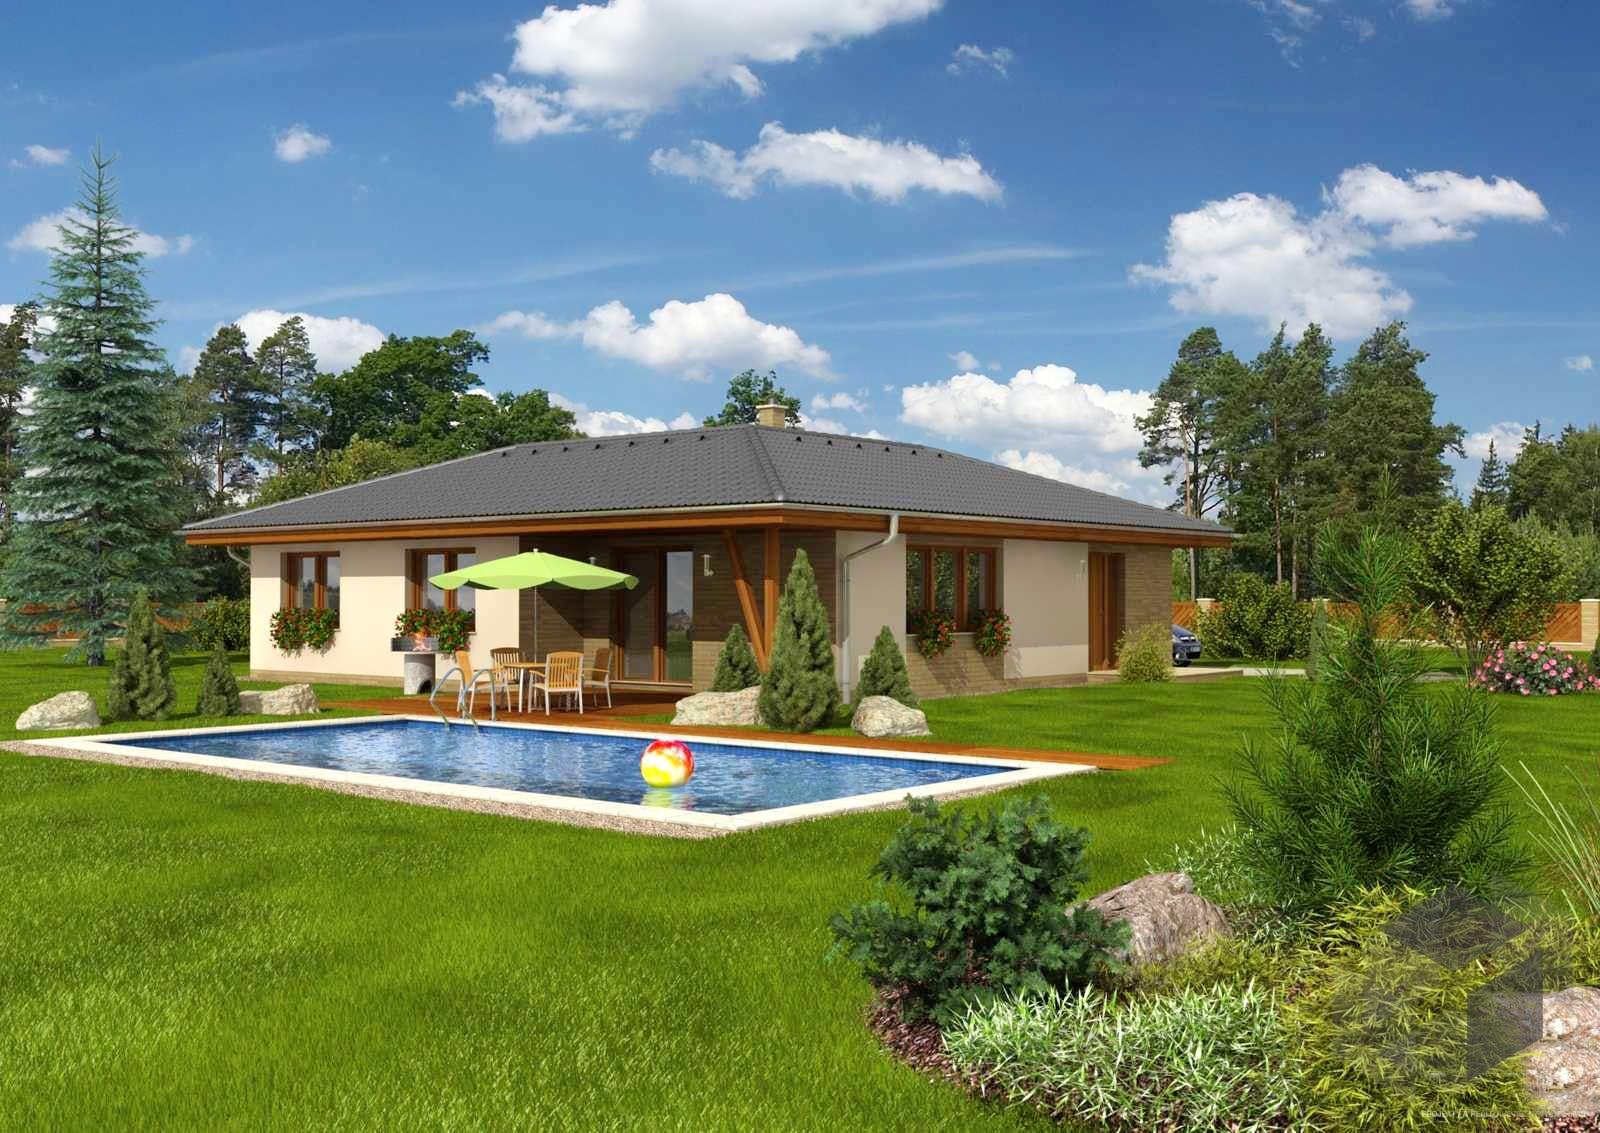 bungalow mallorca inactive von cmf creativ massiv flexibel komplette daten bersicht. Black Bedroom Furniture Sets. Home Design Ideas